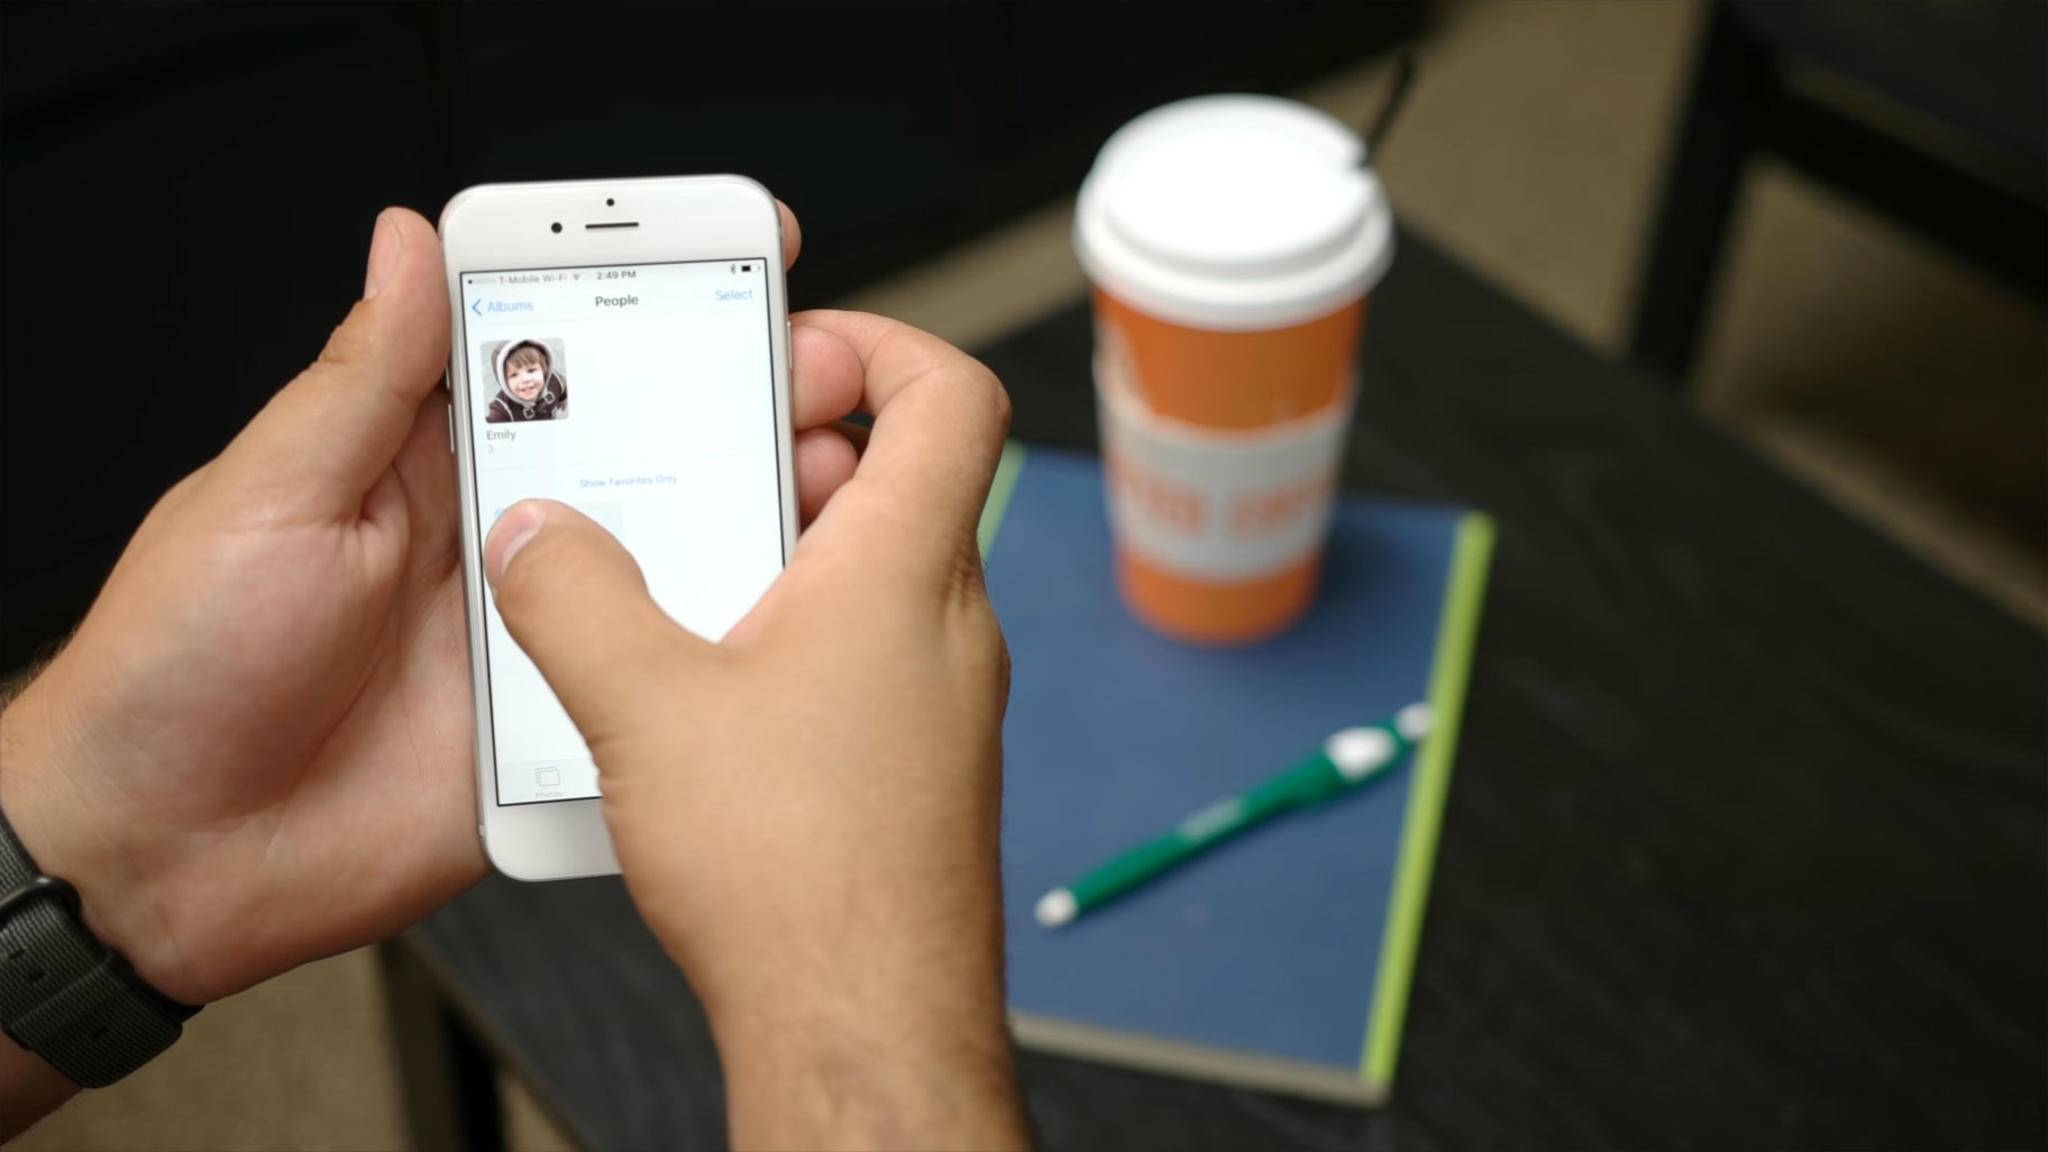 Hass des Steve Jobs auf Microsoft-Manager gebar das iPhone